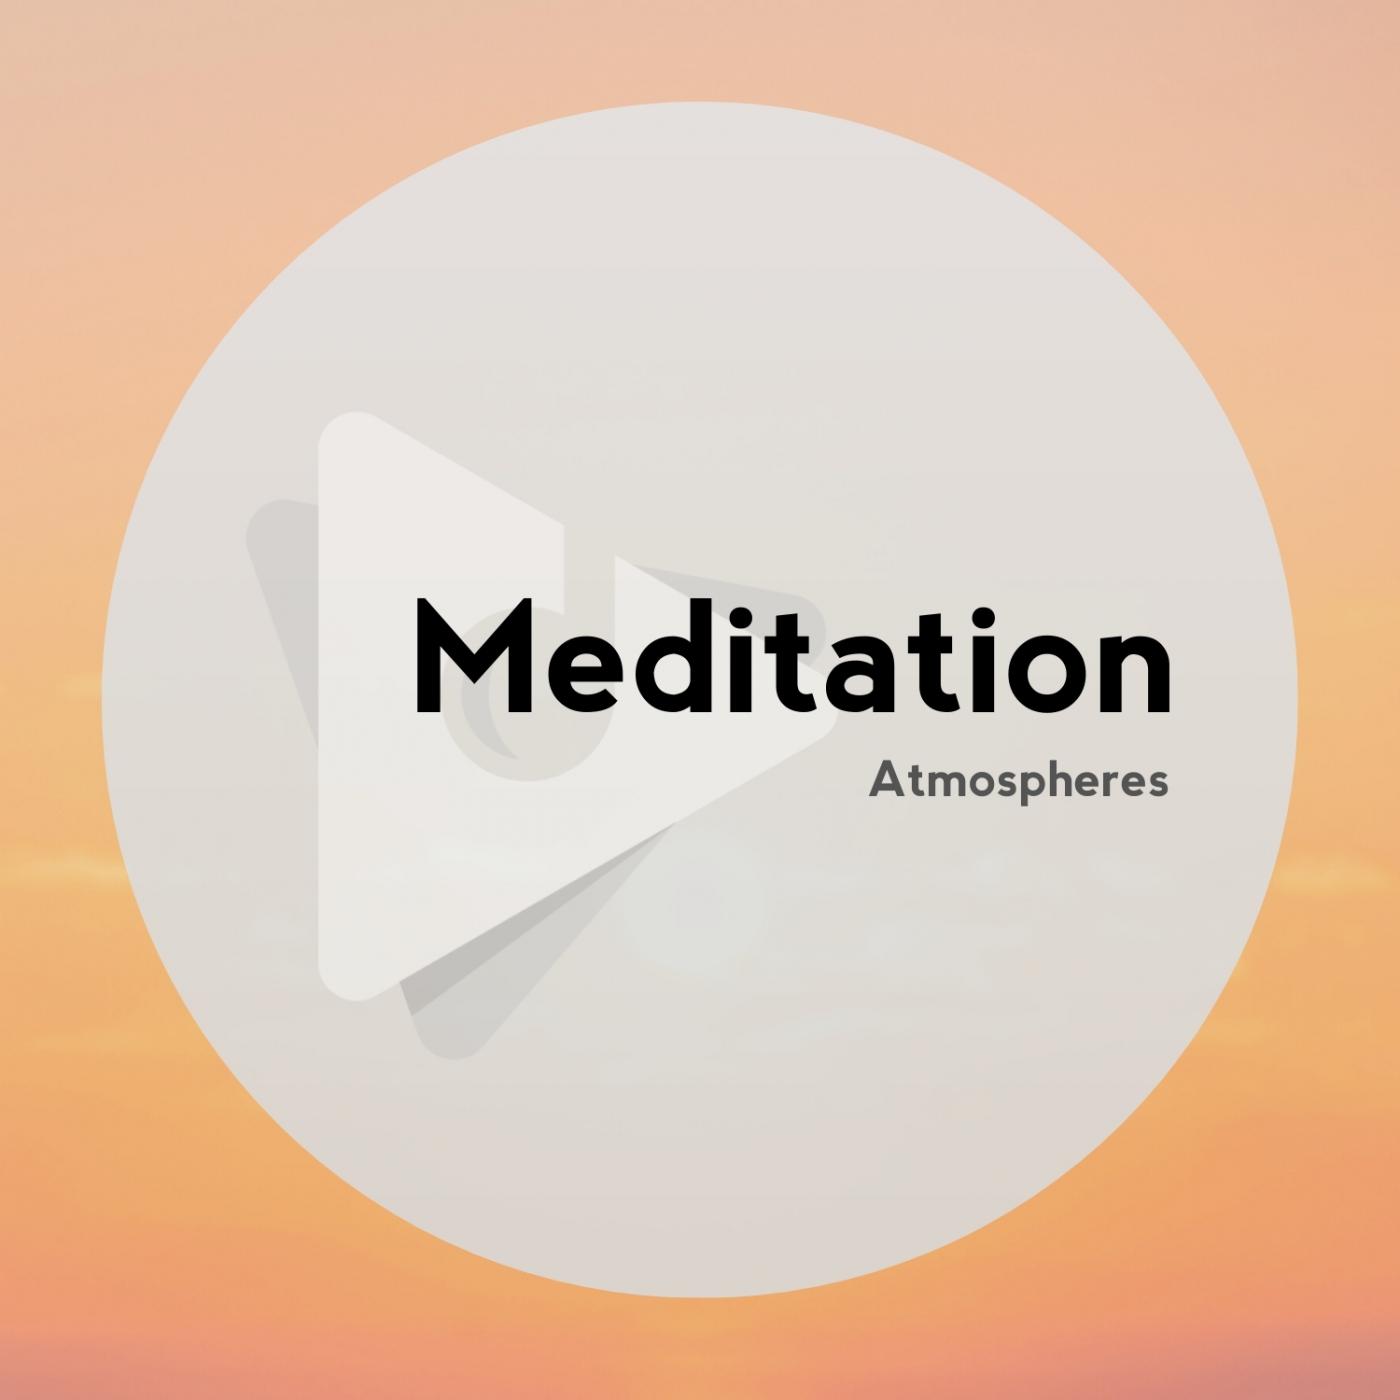 Meditation Atmospheres